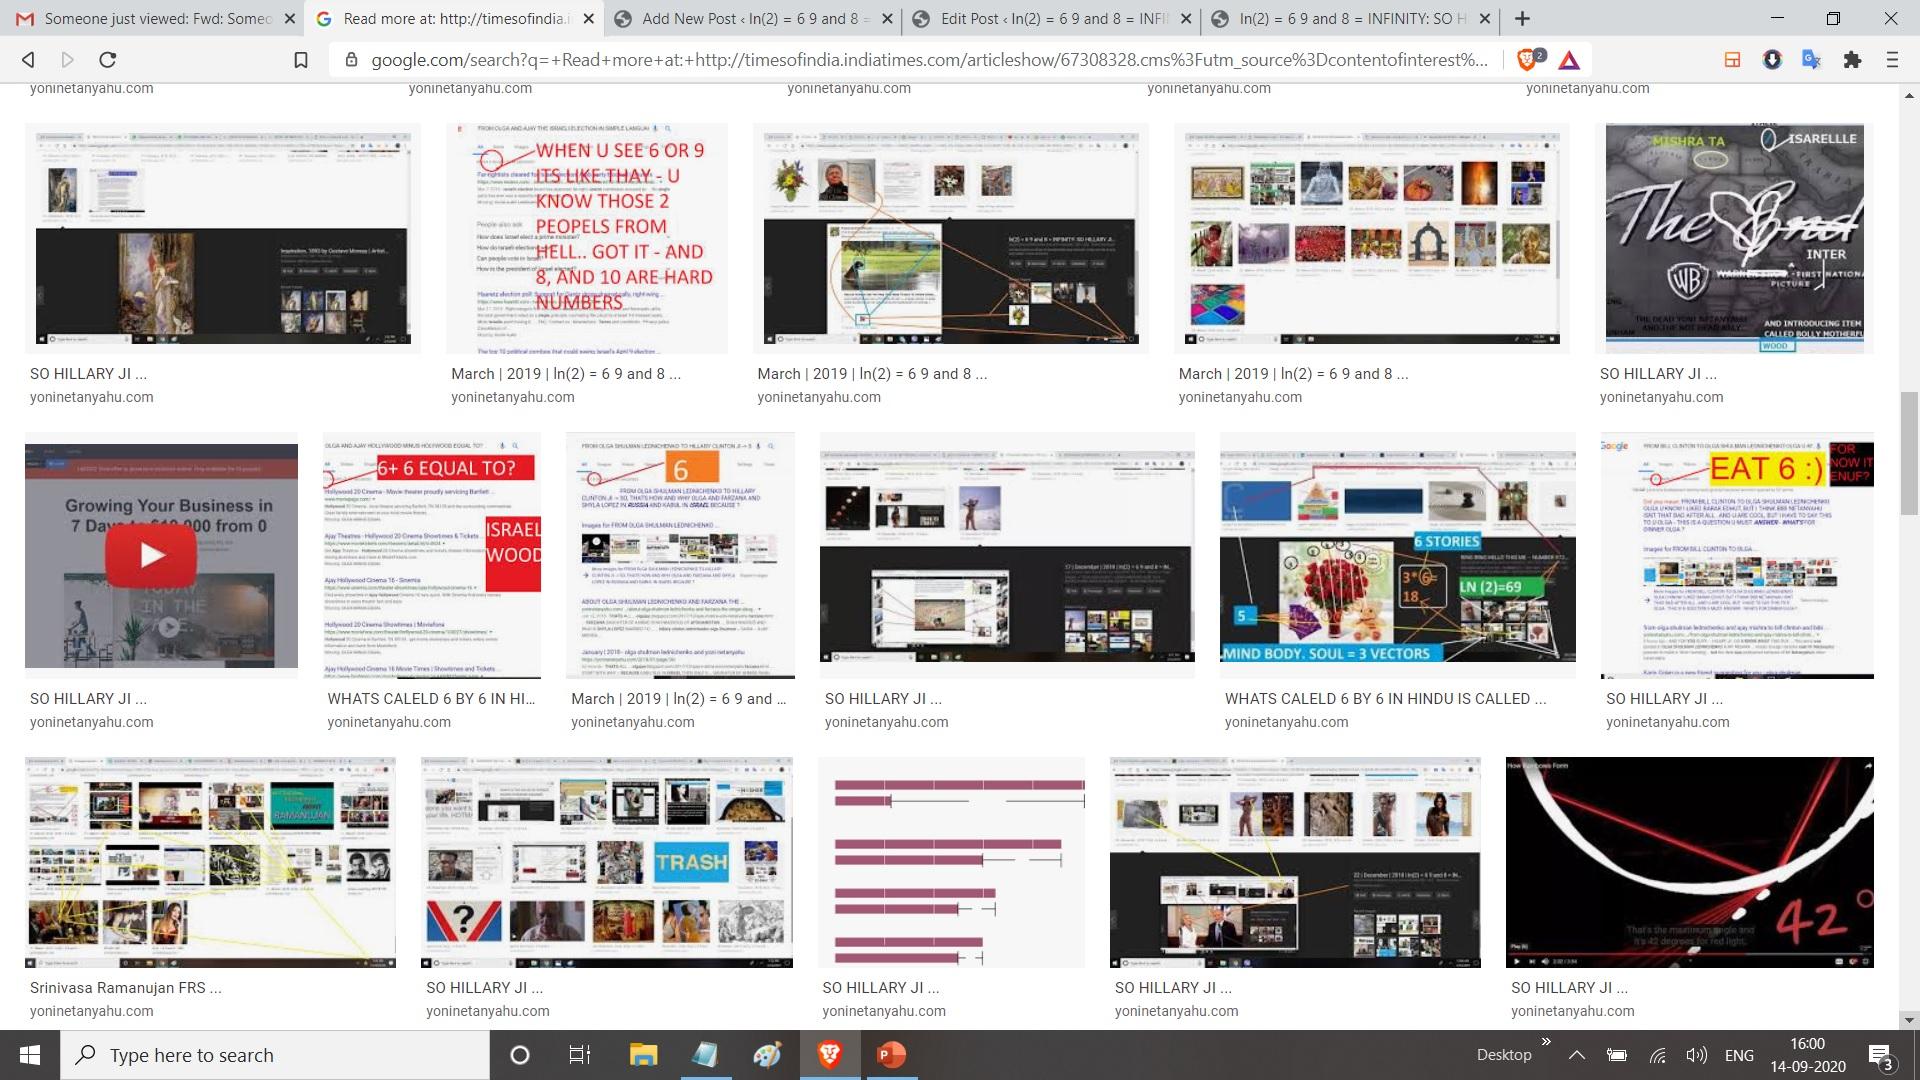 Read more at: http://timesofindia.indiatimes.com/articleshow/67308328.cms?utm_source=contentofinterest&utm_medium=text&utm_campaign=cppst